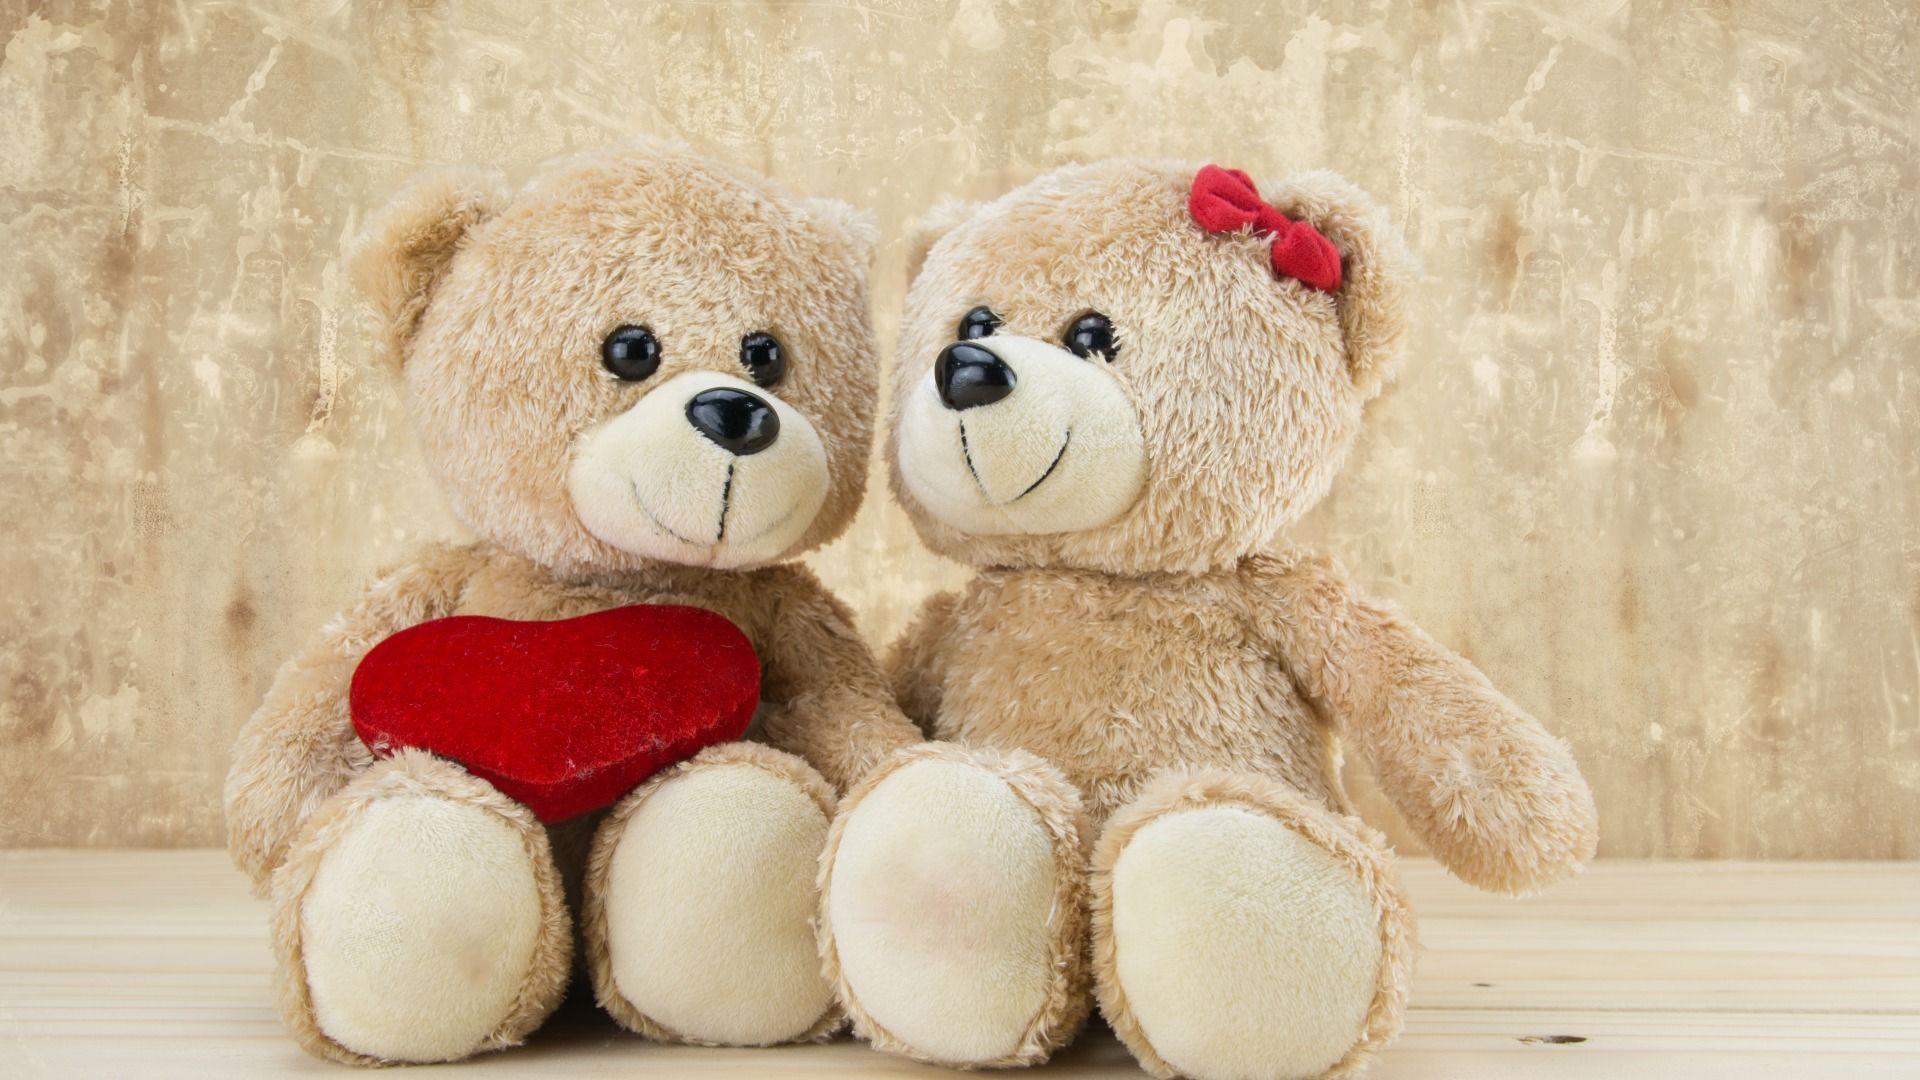 Download Wallpaper Teddy Love Romantic Bear Sweet Toy Love Heart Bear Section Nastroeniya Resolution 1920x1080 Teddy Bear Wallpaper Teddy Teddy Bear